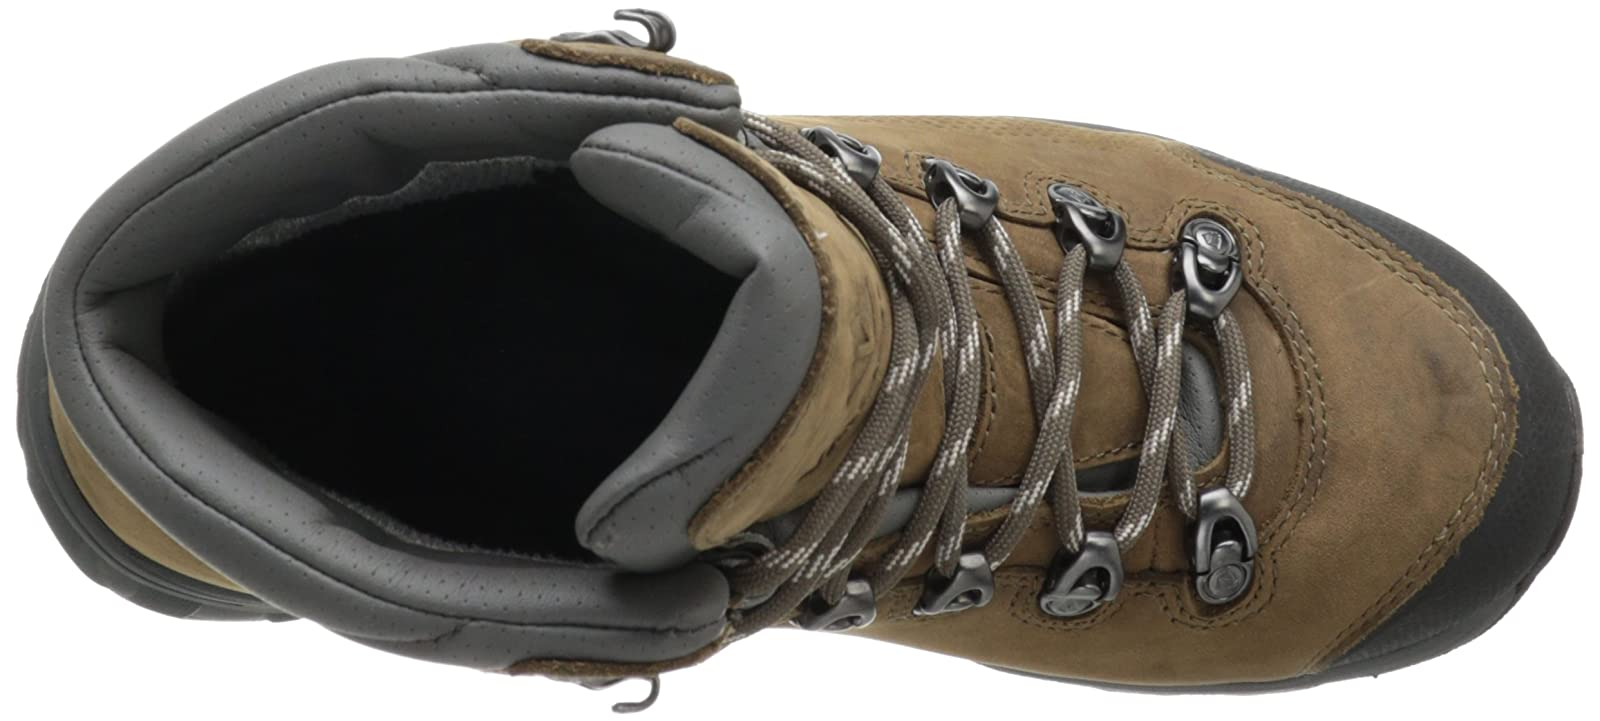 Vasque Women's St. Elias Gore-Tex Hiking Boot 8 M US Women - 13